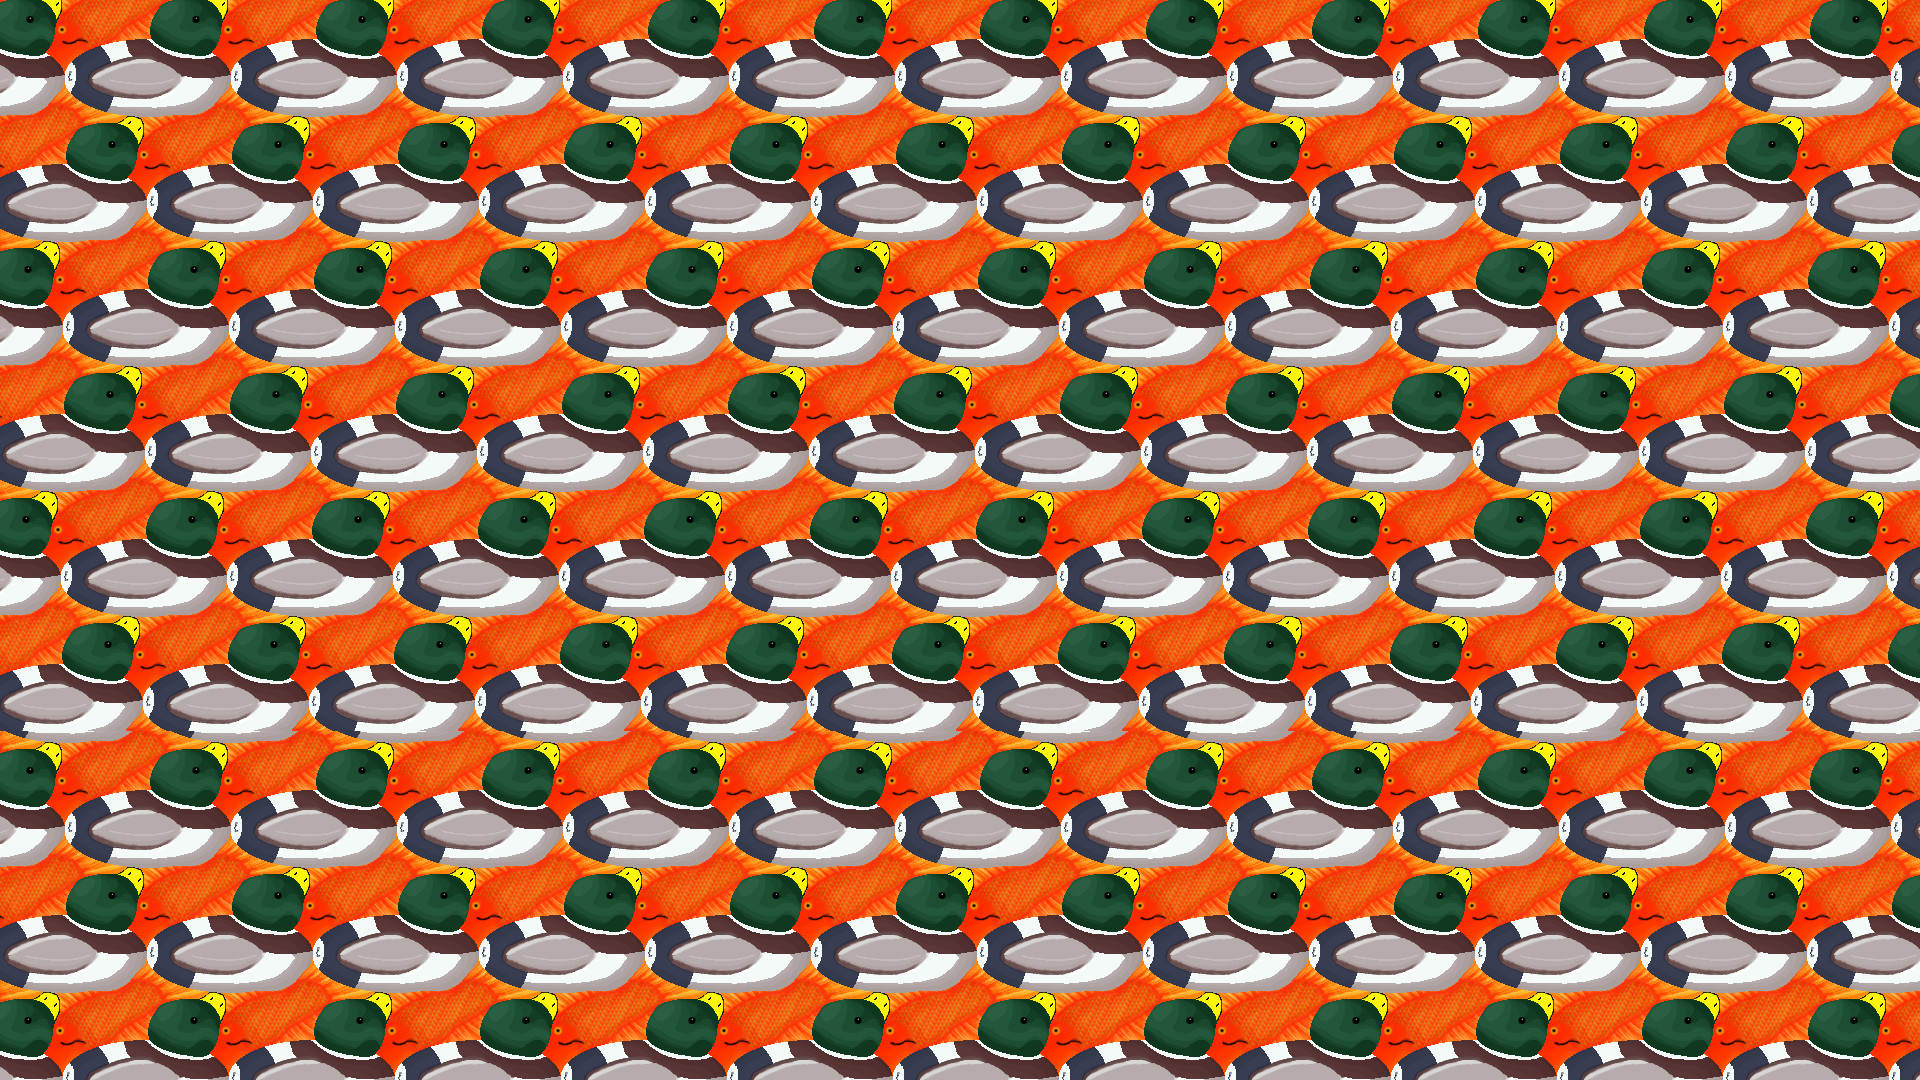 … Escher Ducks Wallpaper by Comrade by Comrade-Pony